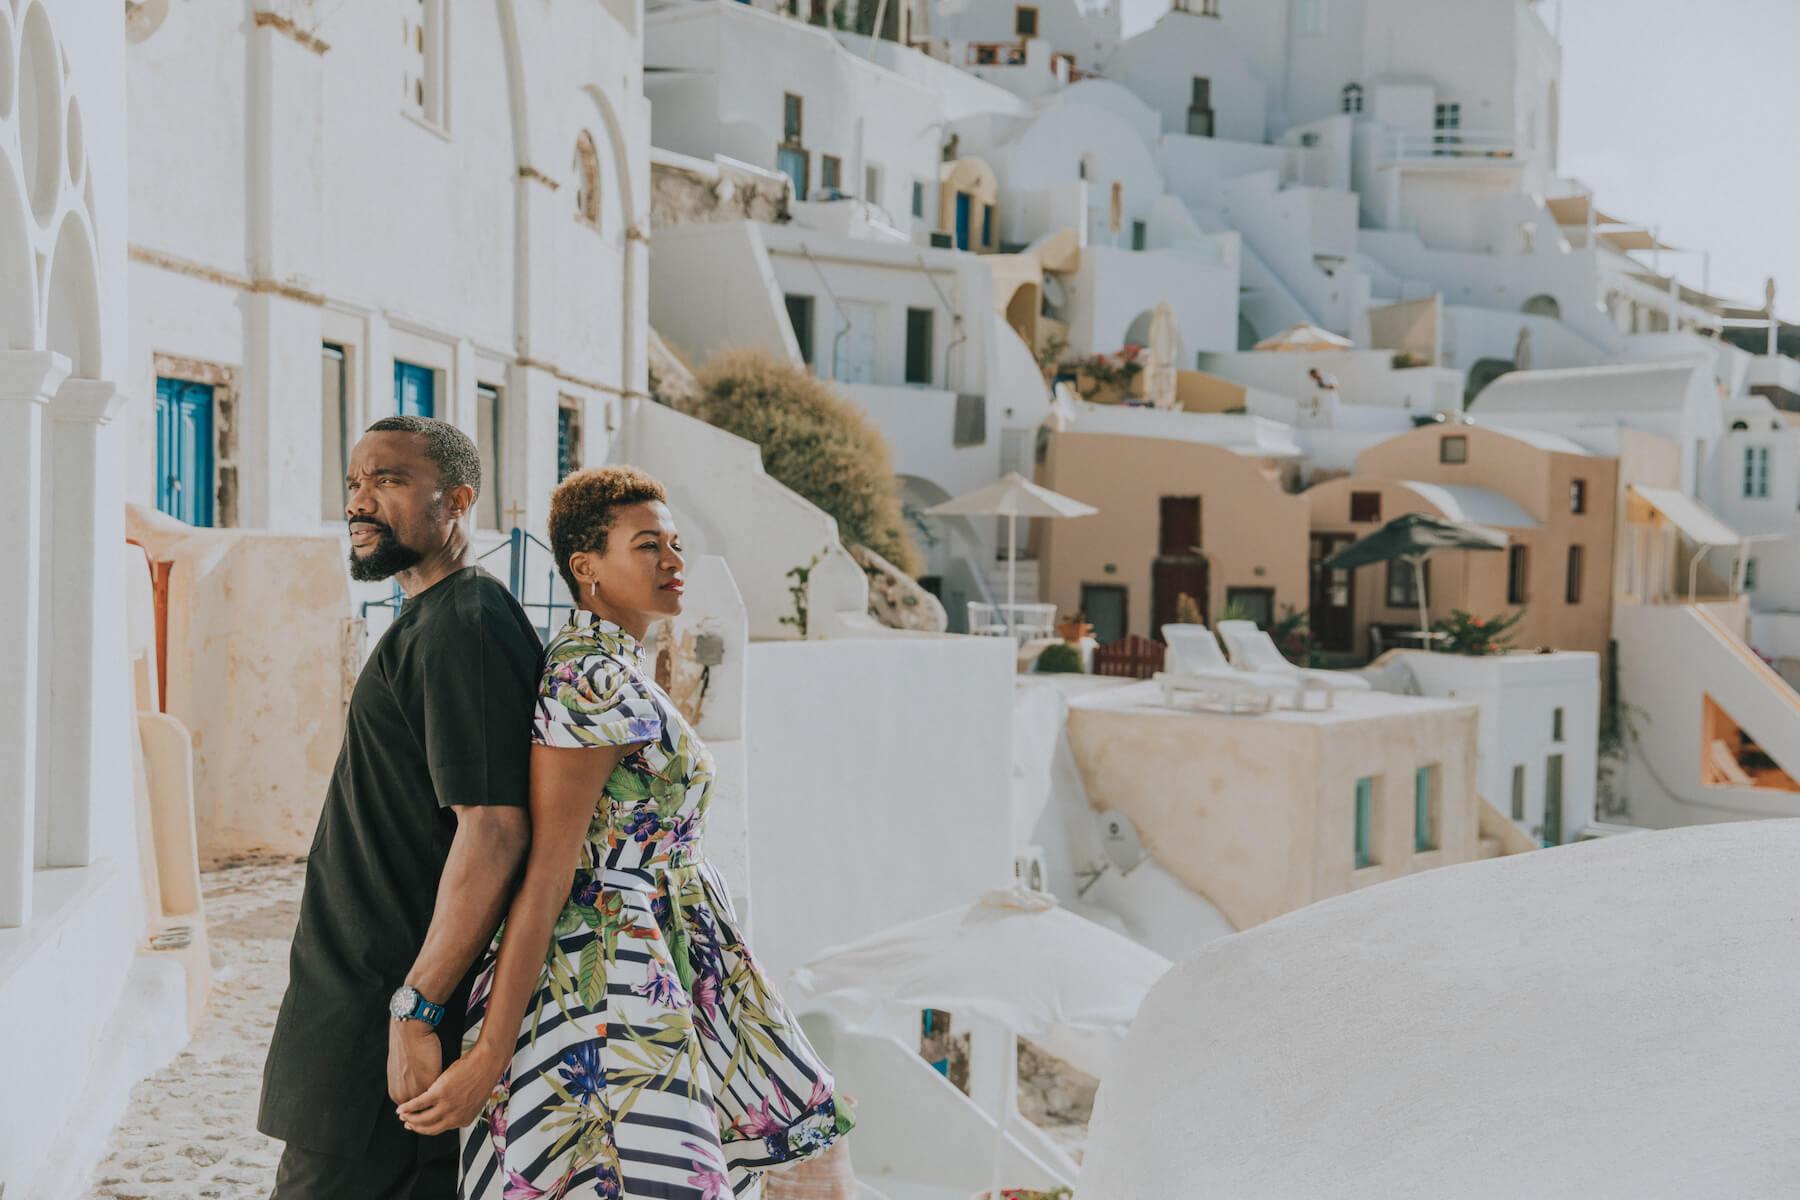 santorini-09-24-2019-couples-trip-14_original